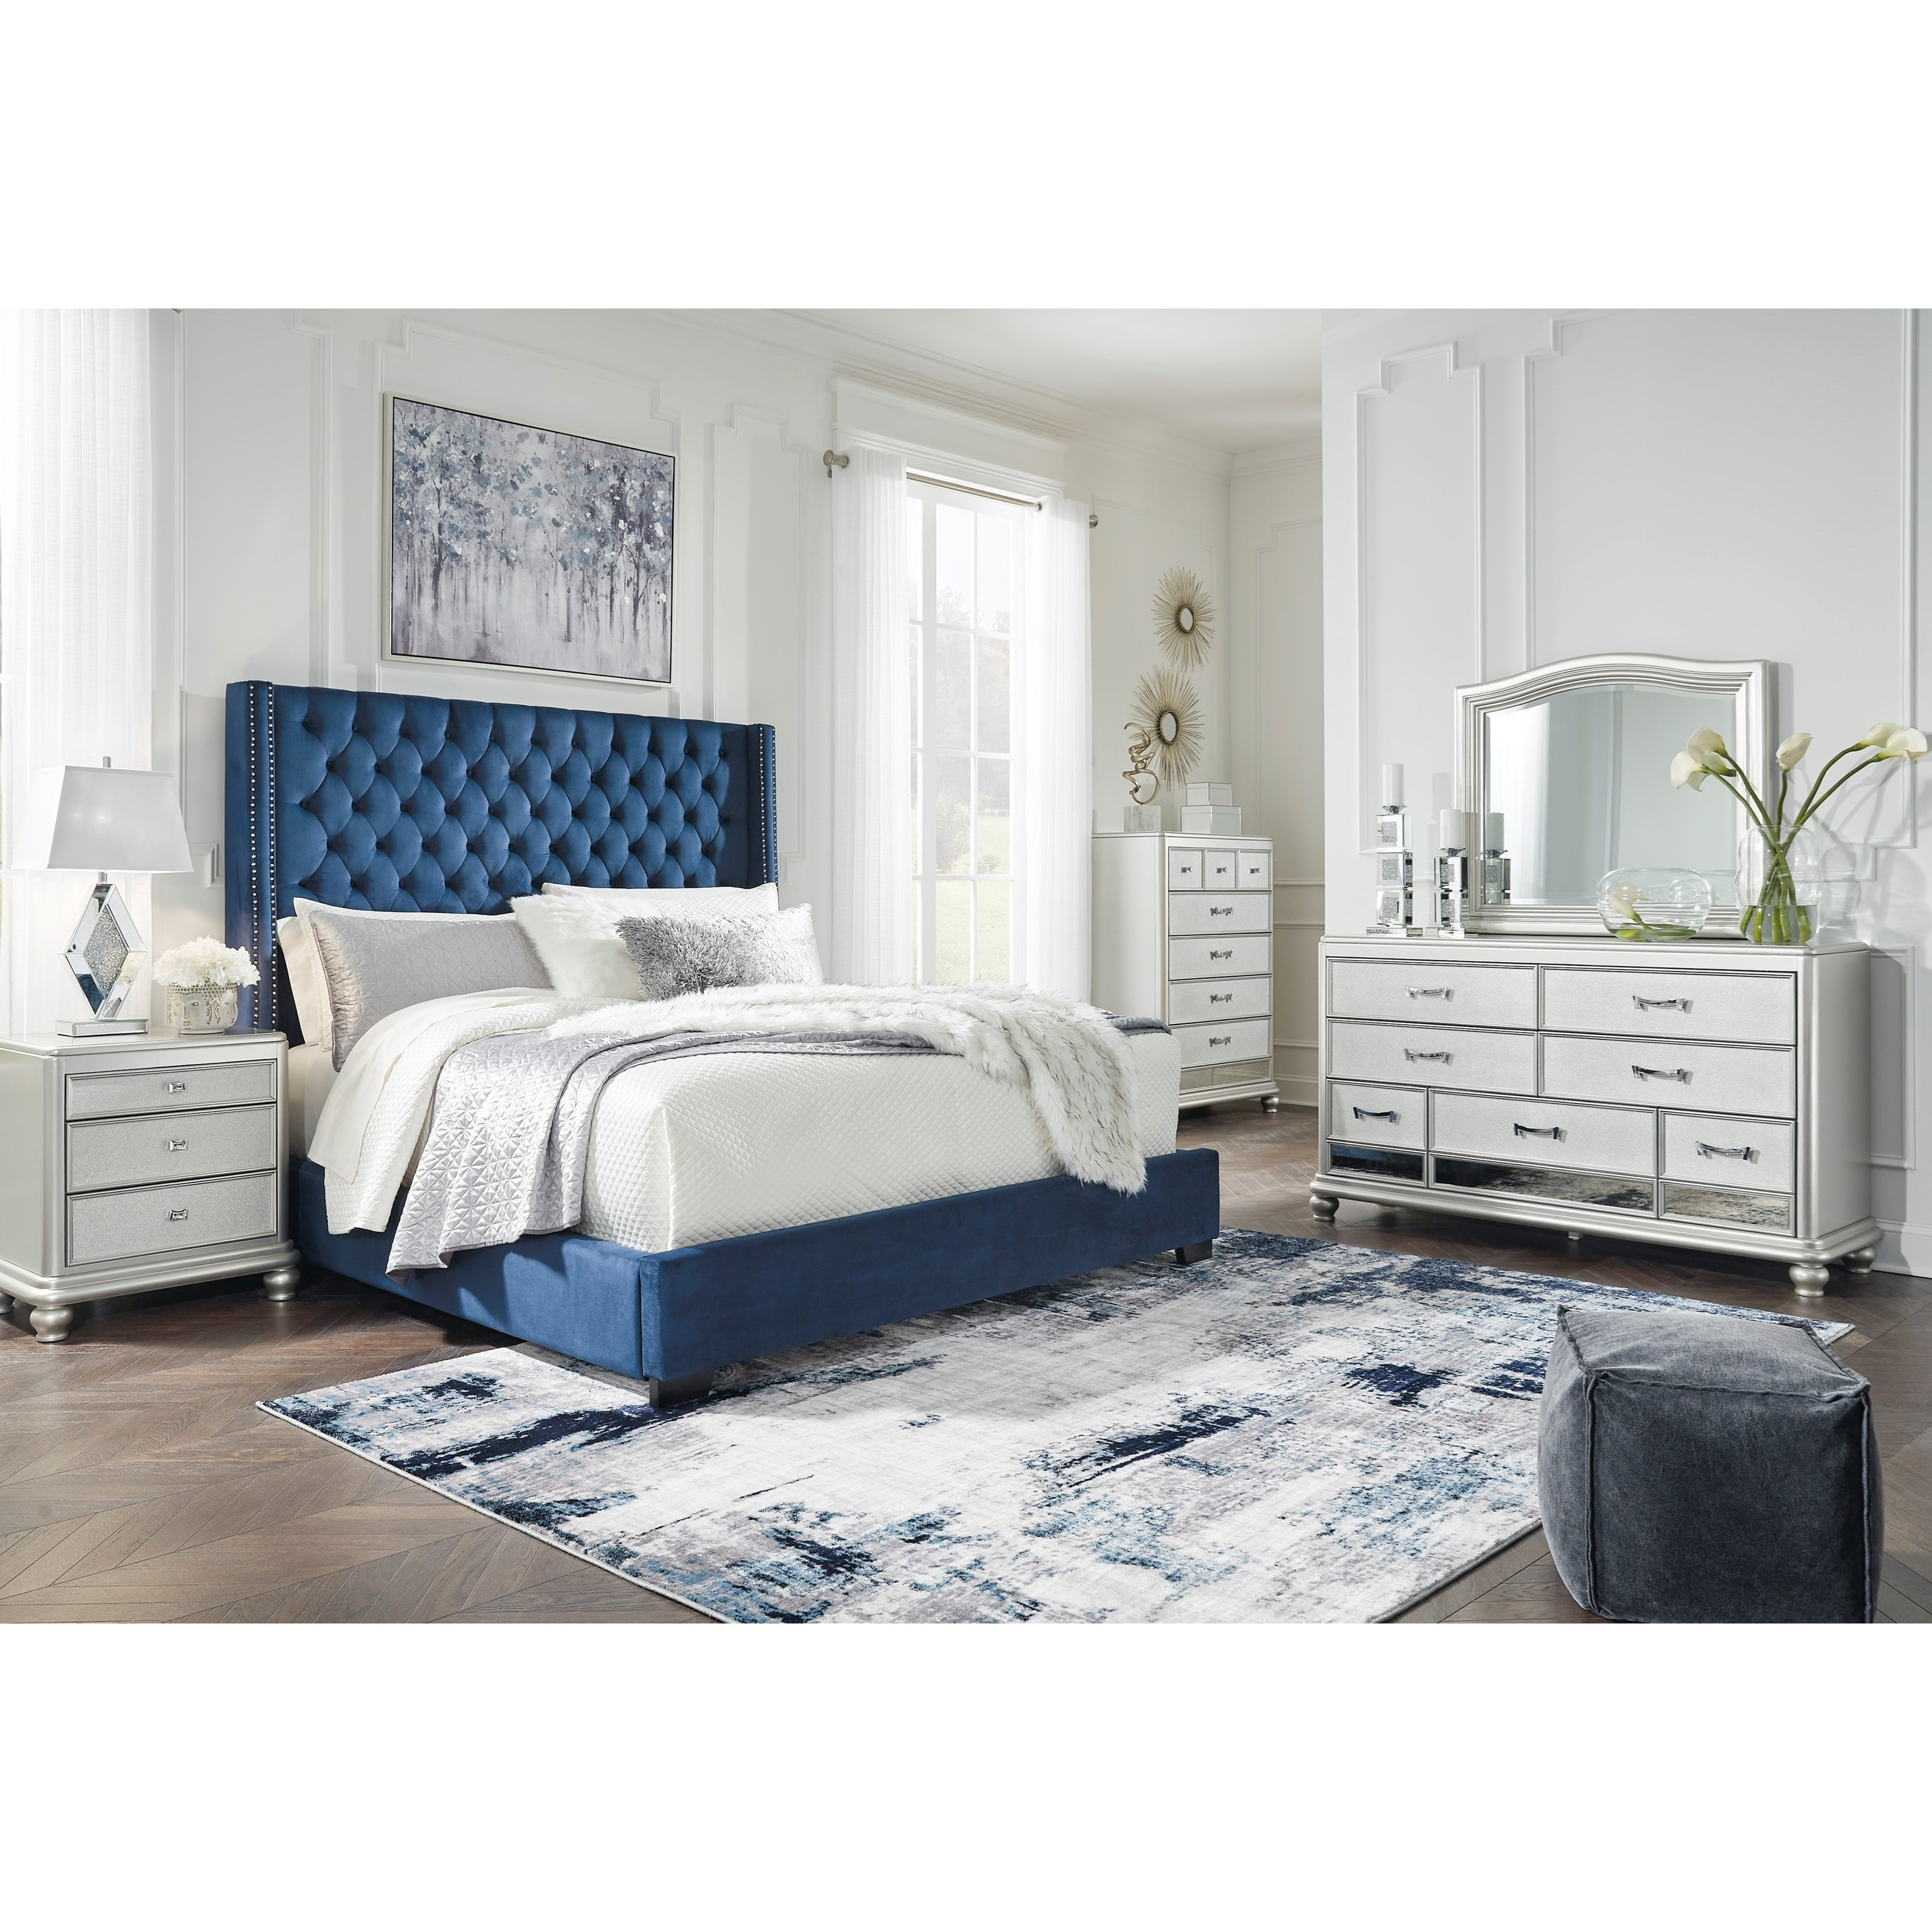 Coralayne California King Bedroom Group by Ashley (Signature Design) at Johnny Janosik